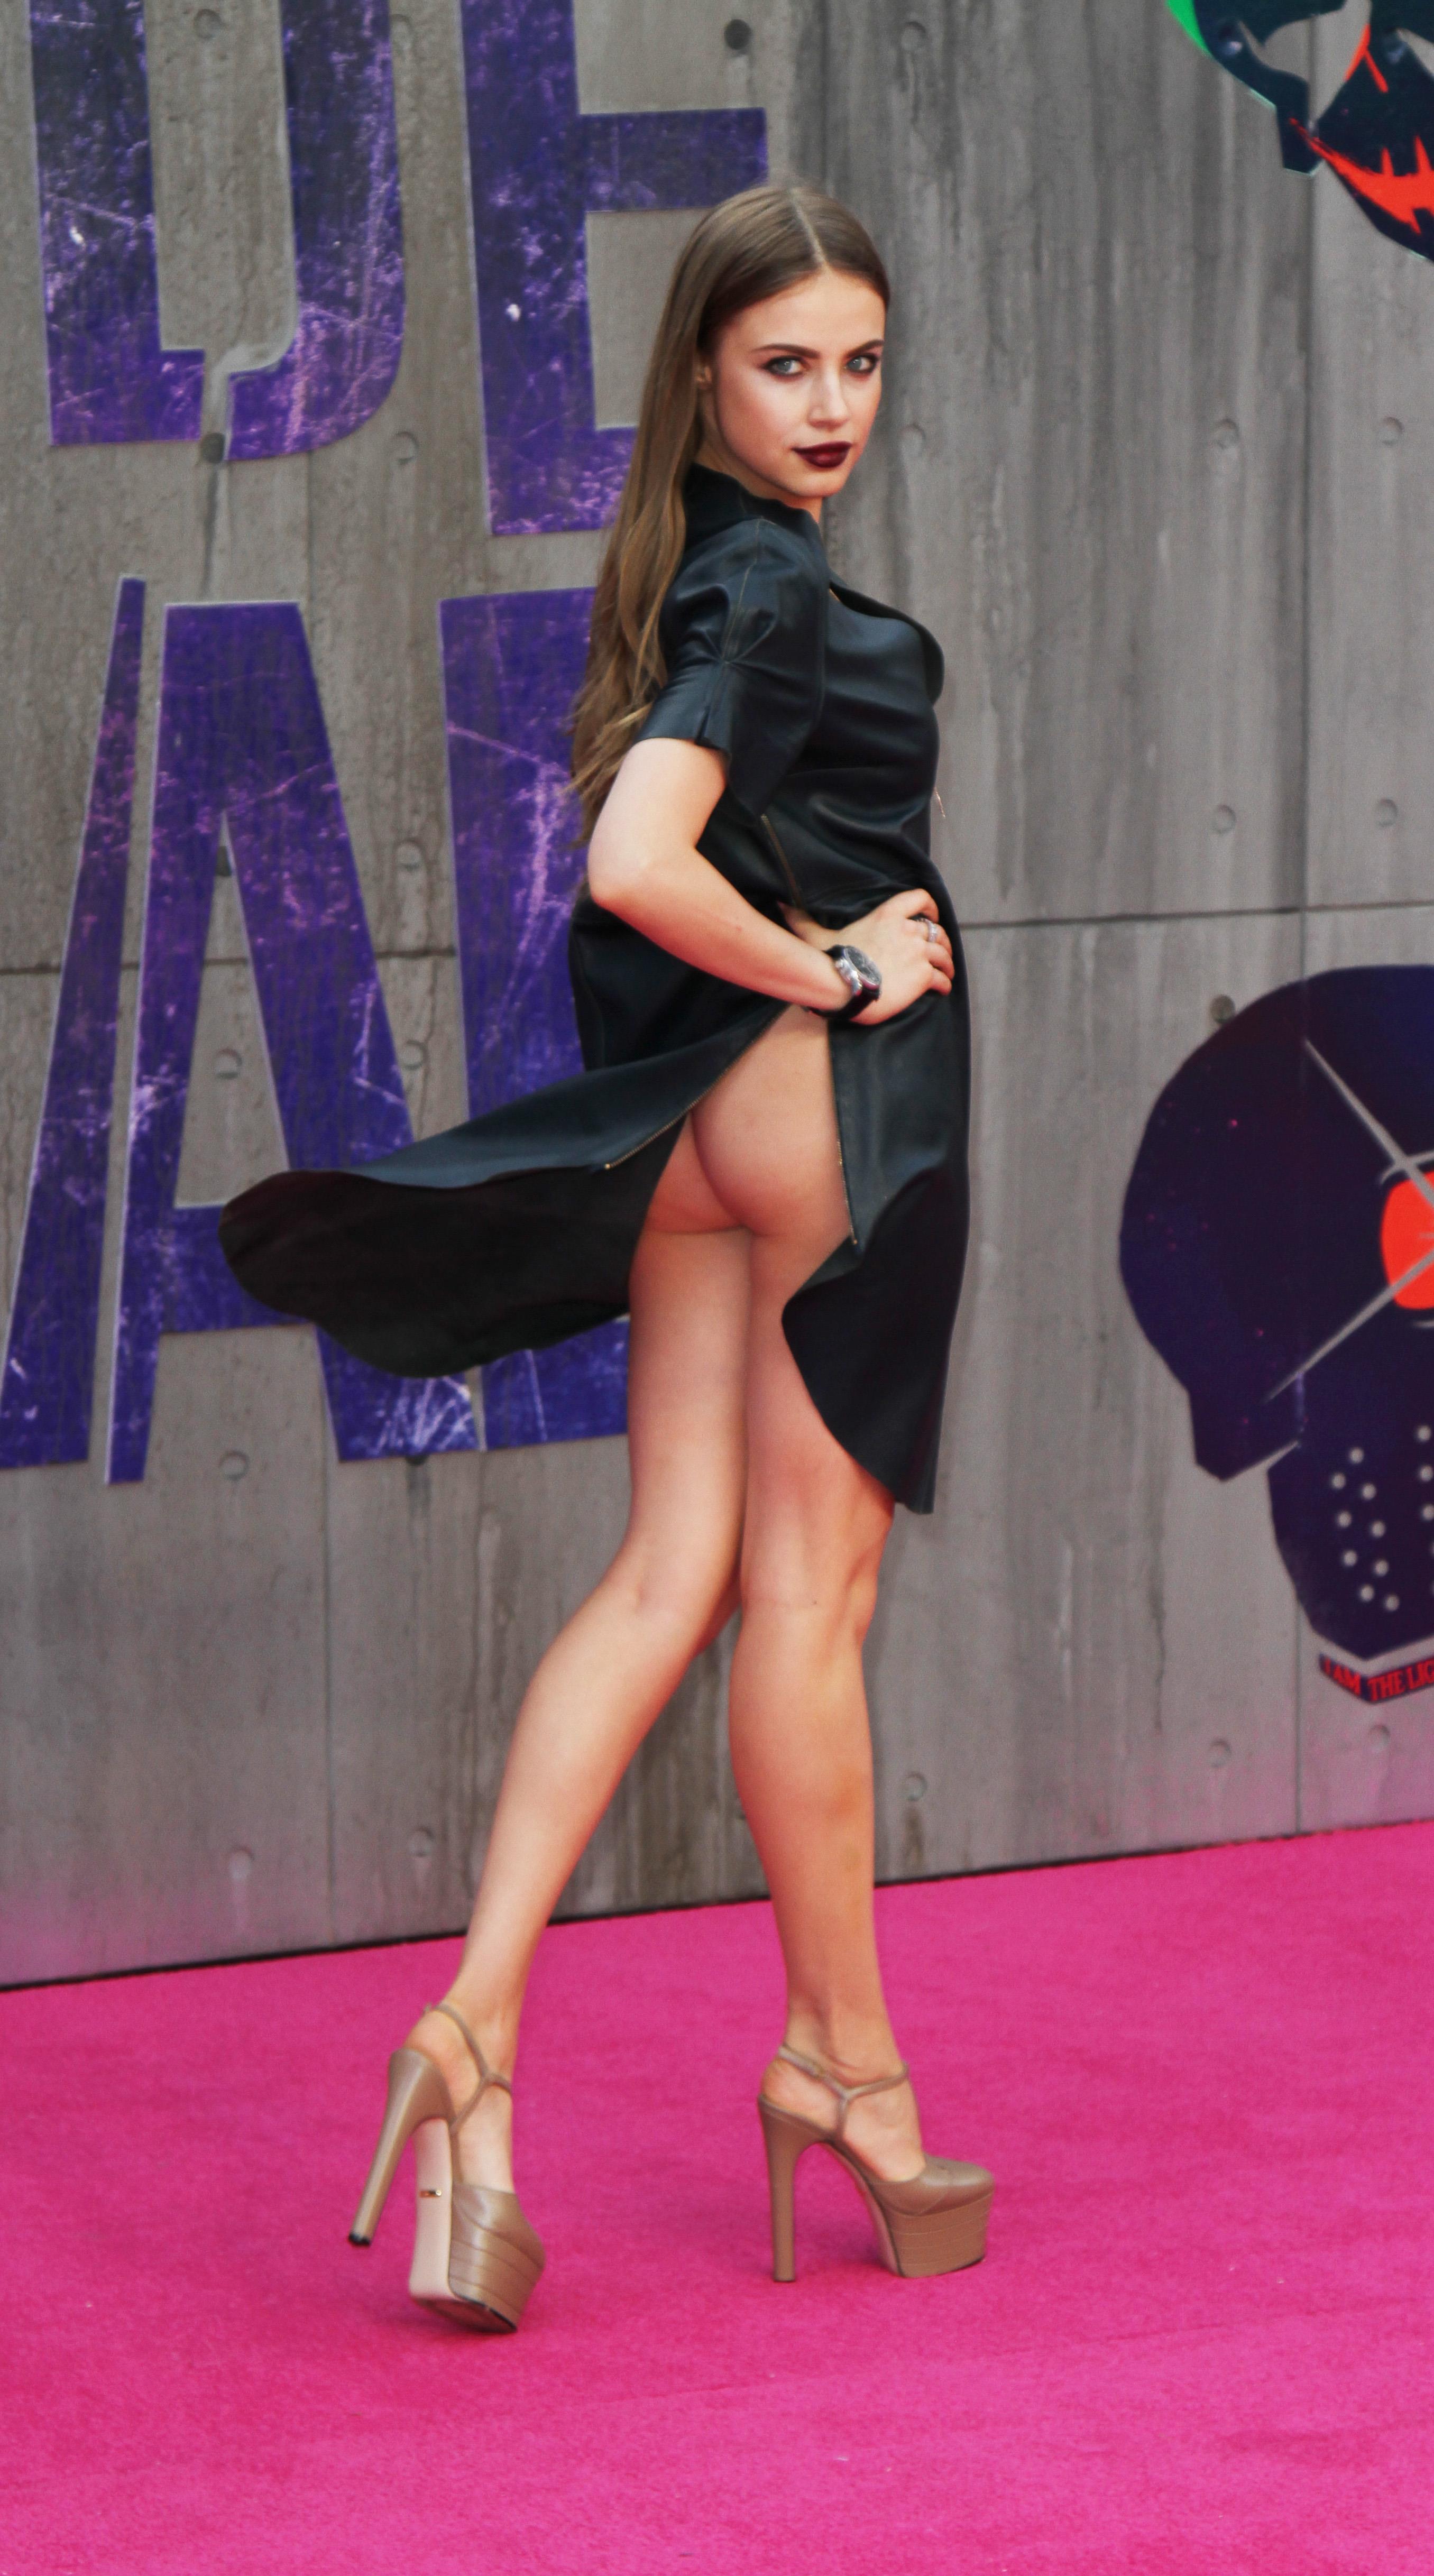 Xenia Tchoumitcheva Nude Photos and Videos naked (61 image)